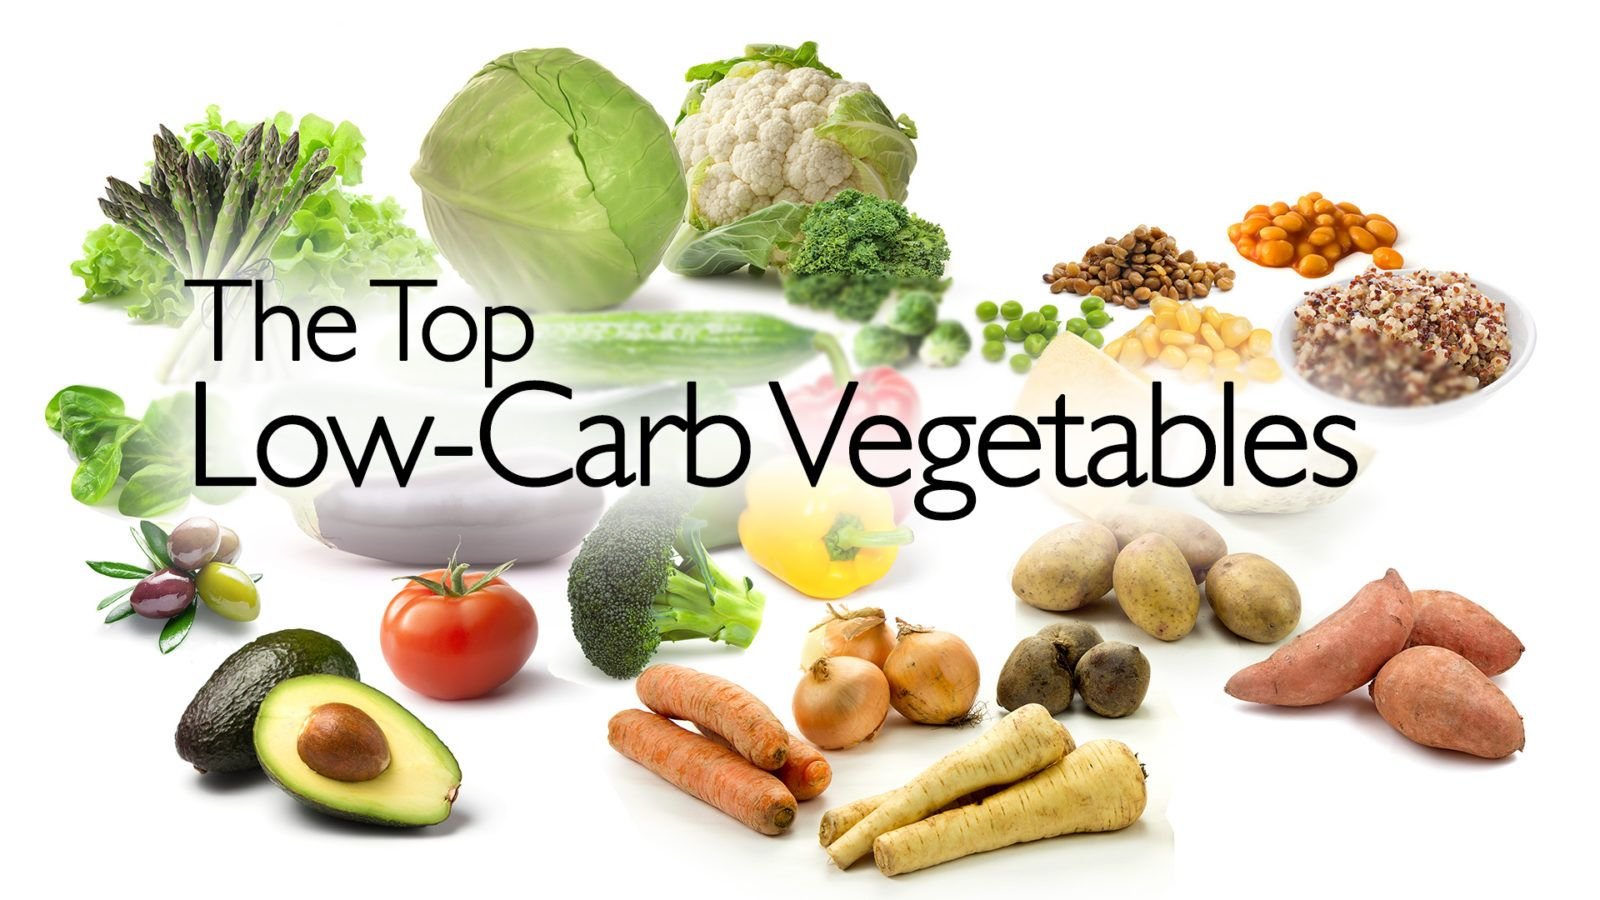 Top Low-Carb Vegetables